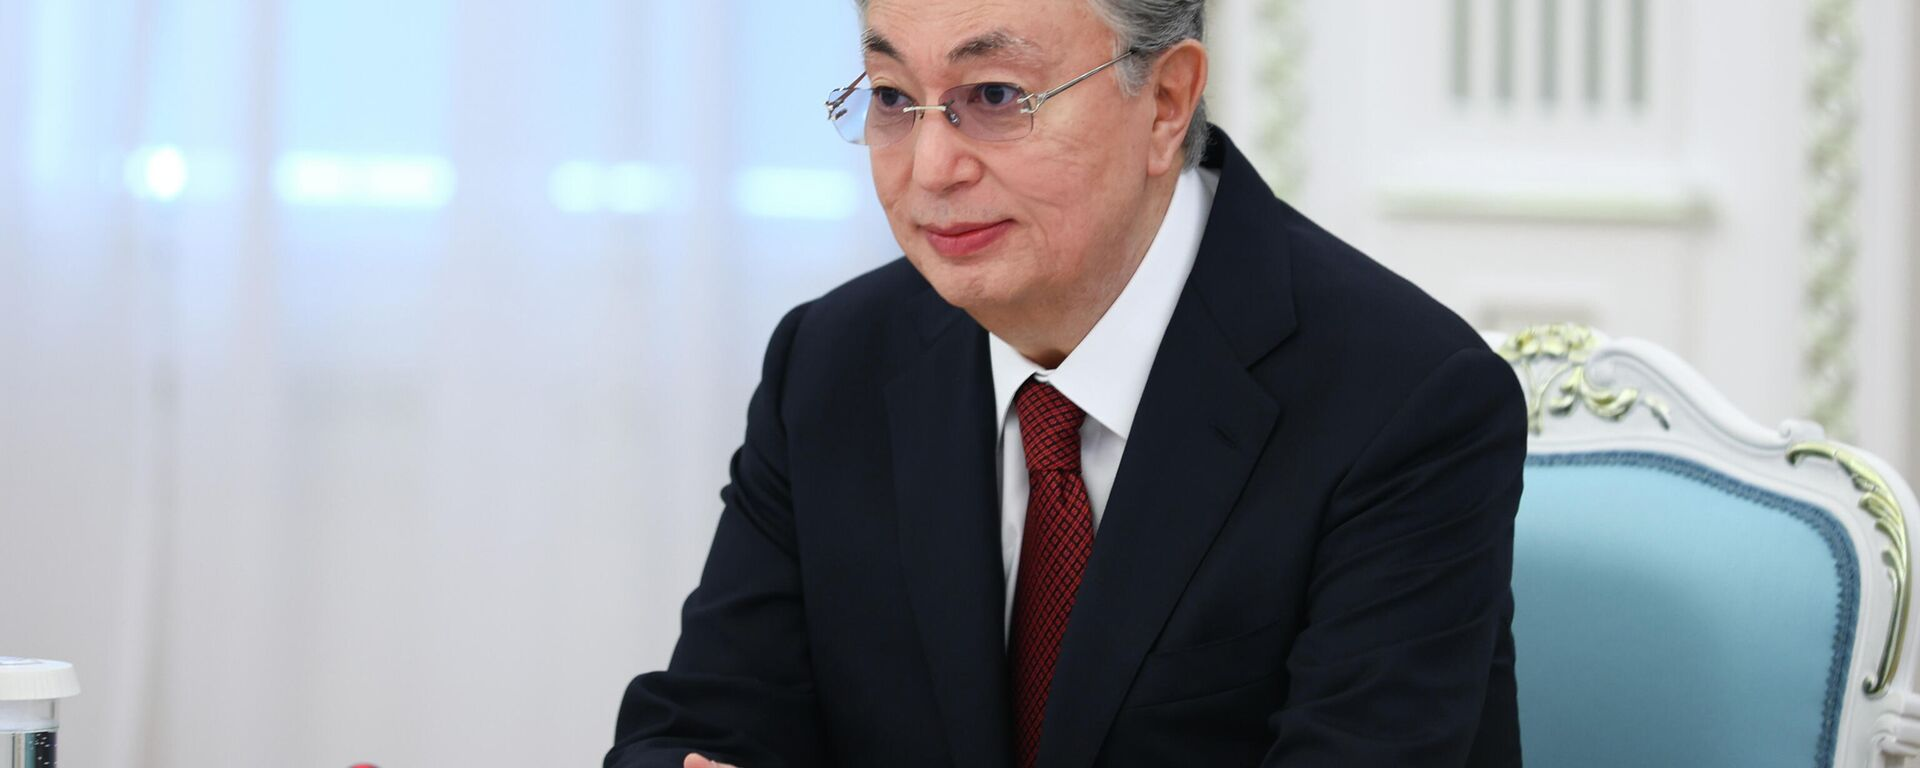 Prezident Kazaxstana Kasыm-Jomart Tokayev - Sputnik Oʻzbekiston, 1920, 09.09.2021